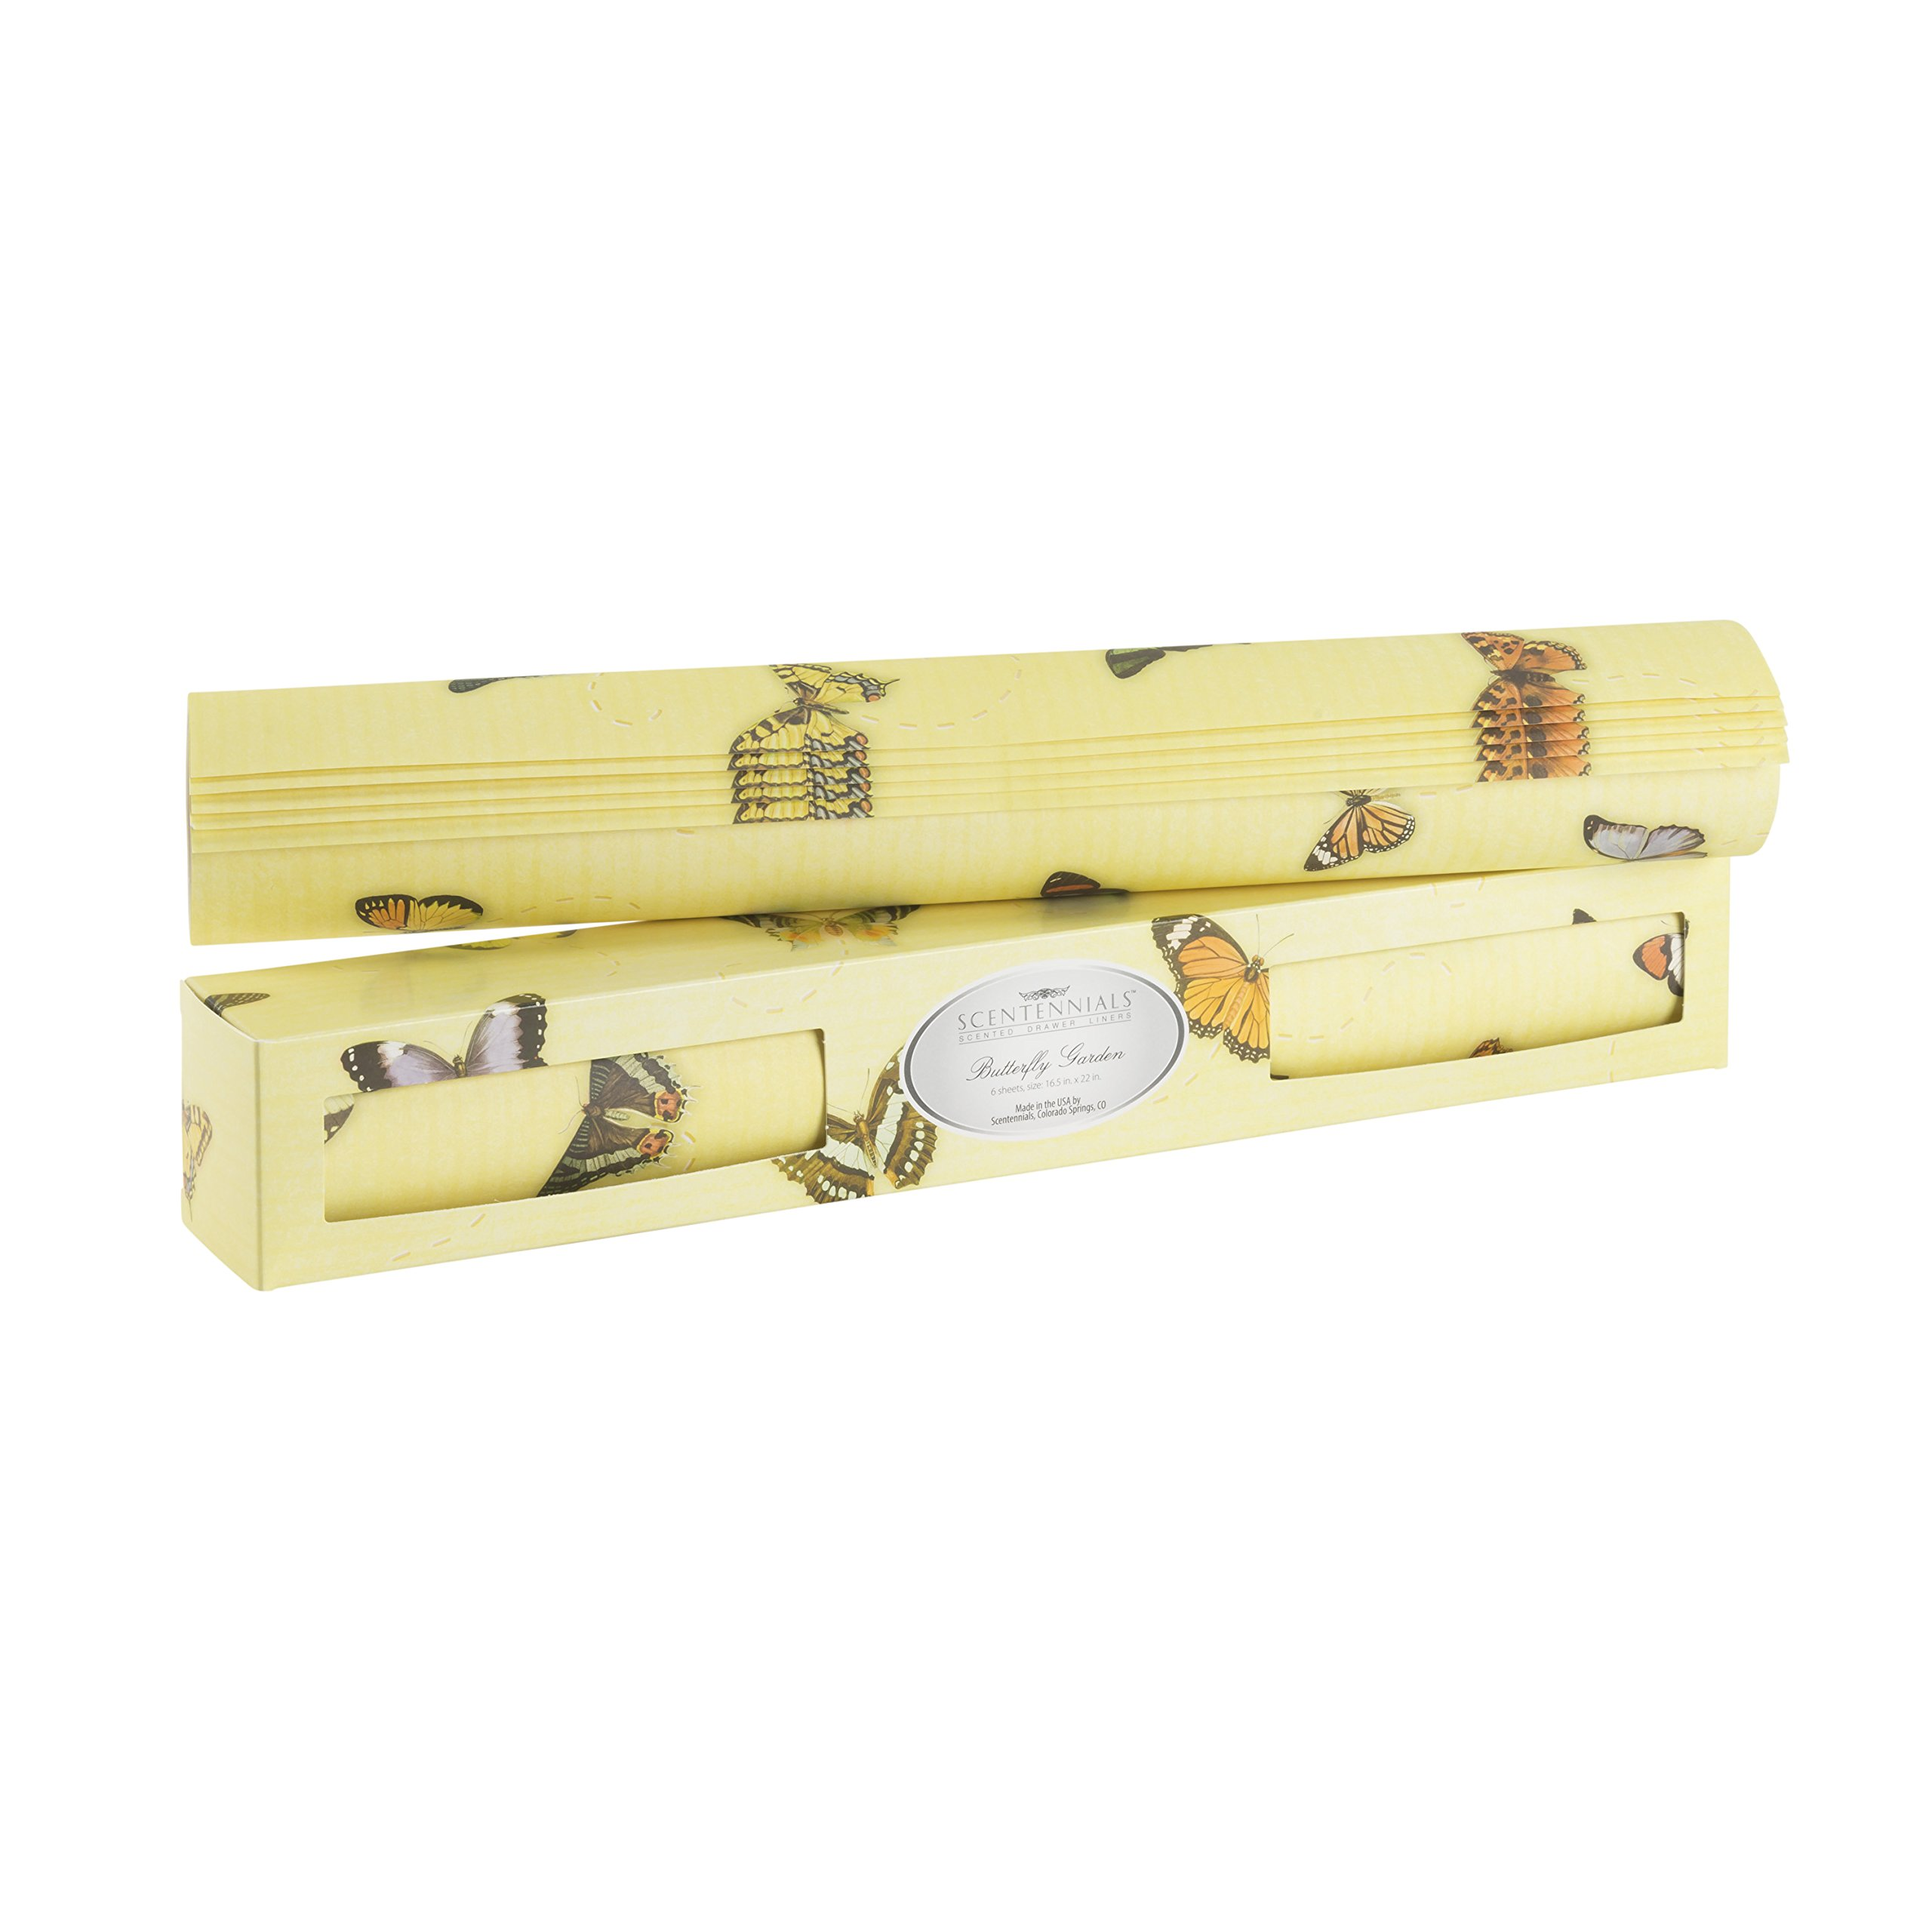 Scentennials BUTTERFLY GARDEN (6 SHEETS) Scented Fragrant Shelf & Drawer Liners 16.5'' x 22'' - Great for Dresser, Kitchen, Bathroom, Vanity & Linen Closet